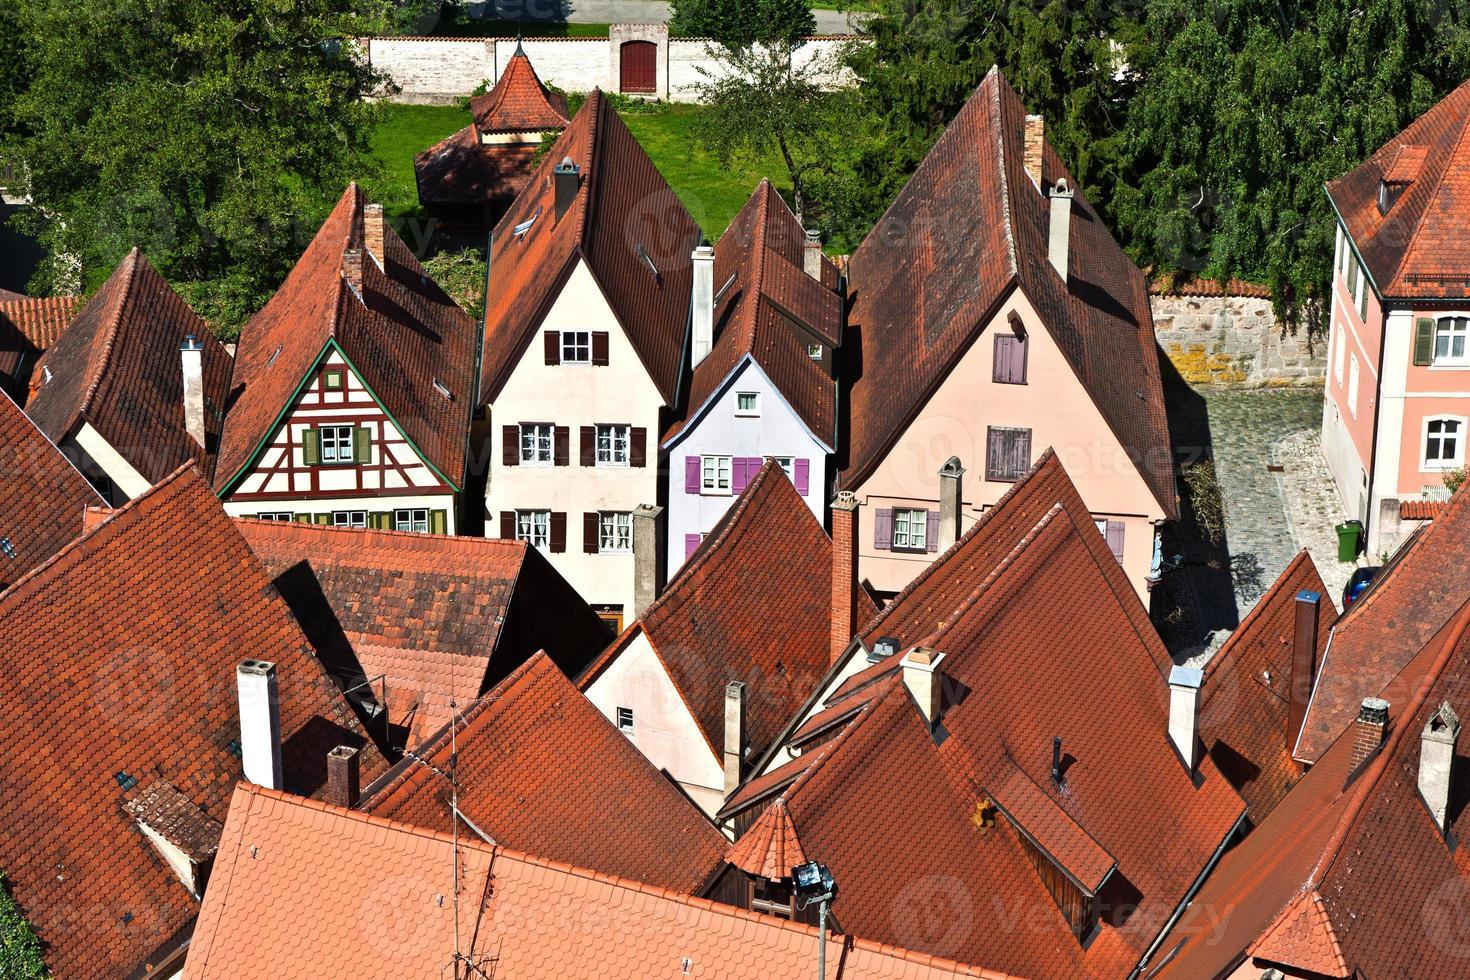 città medievale dinkelsbuehl in germania foto